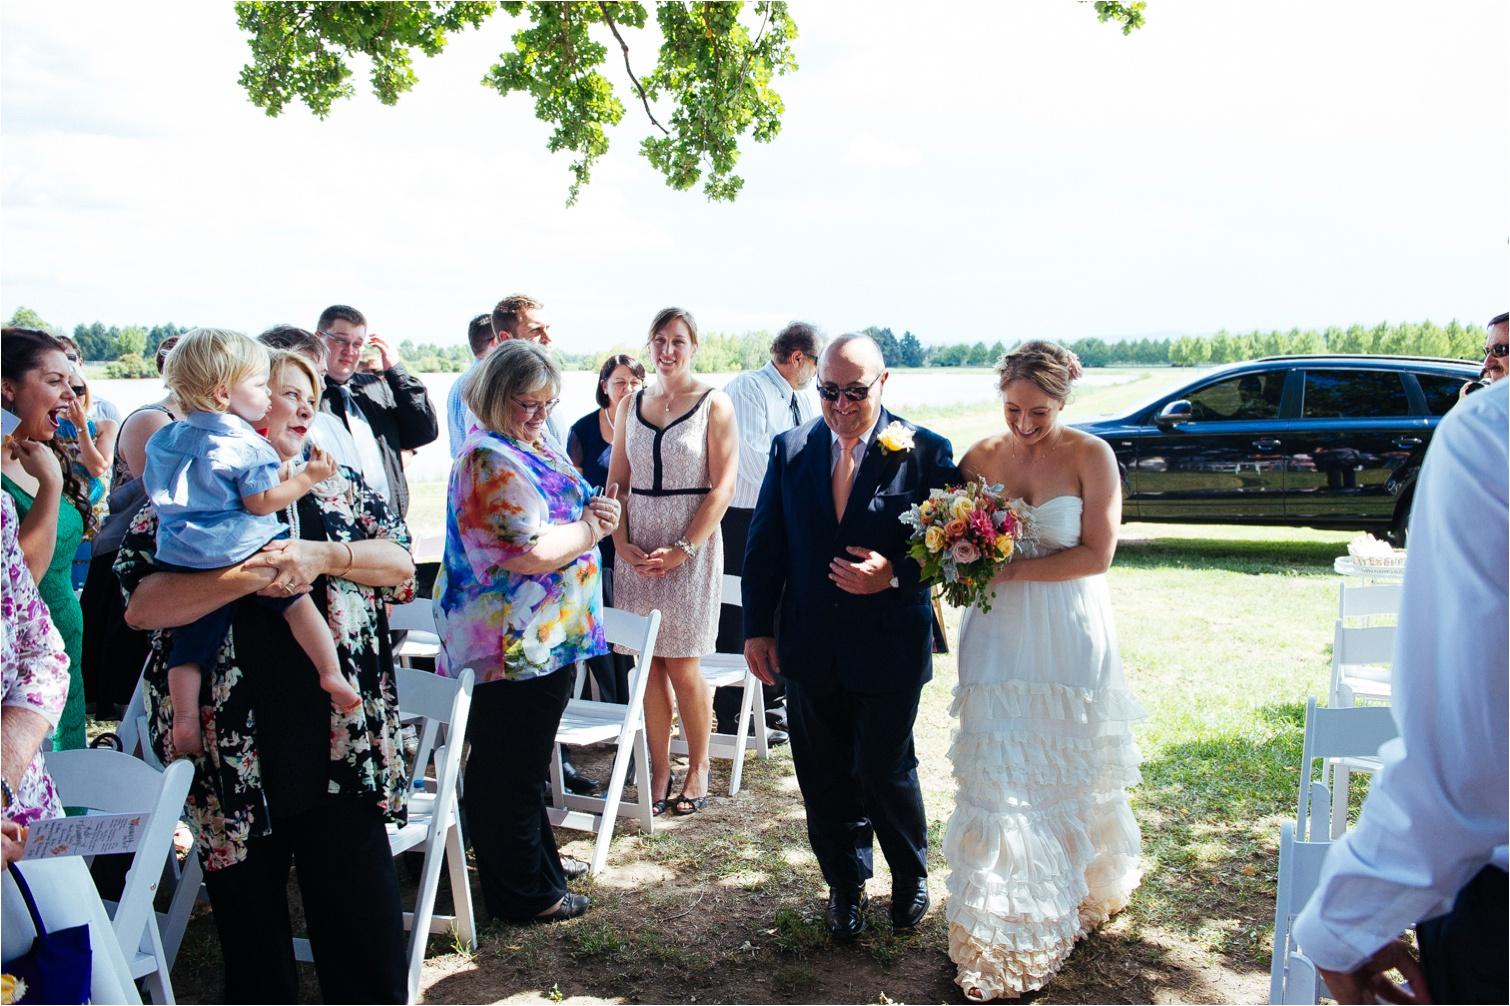 Jenny&Mitch_Sebel_Windsor_Sydney_Polo_Club_wedding-by_The_Follans_Gold_Coast_Wedding_Photographers_0046.jpg